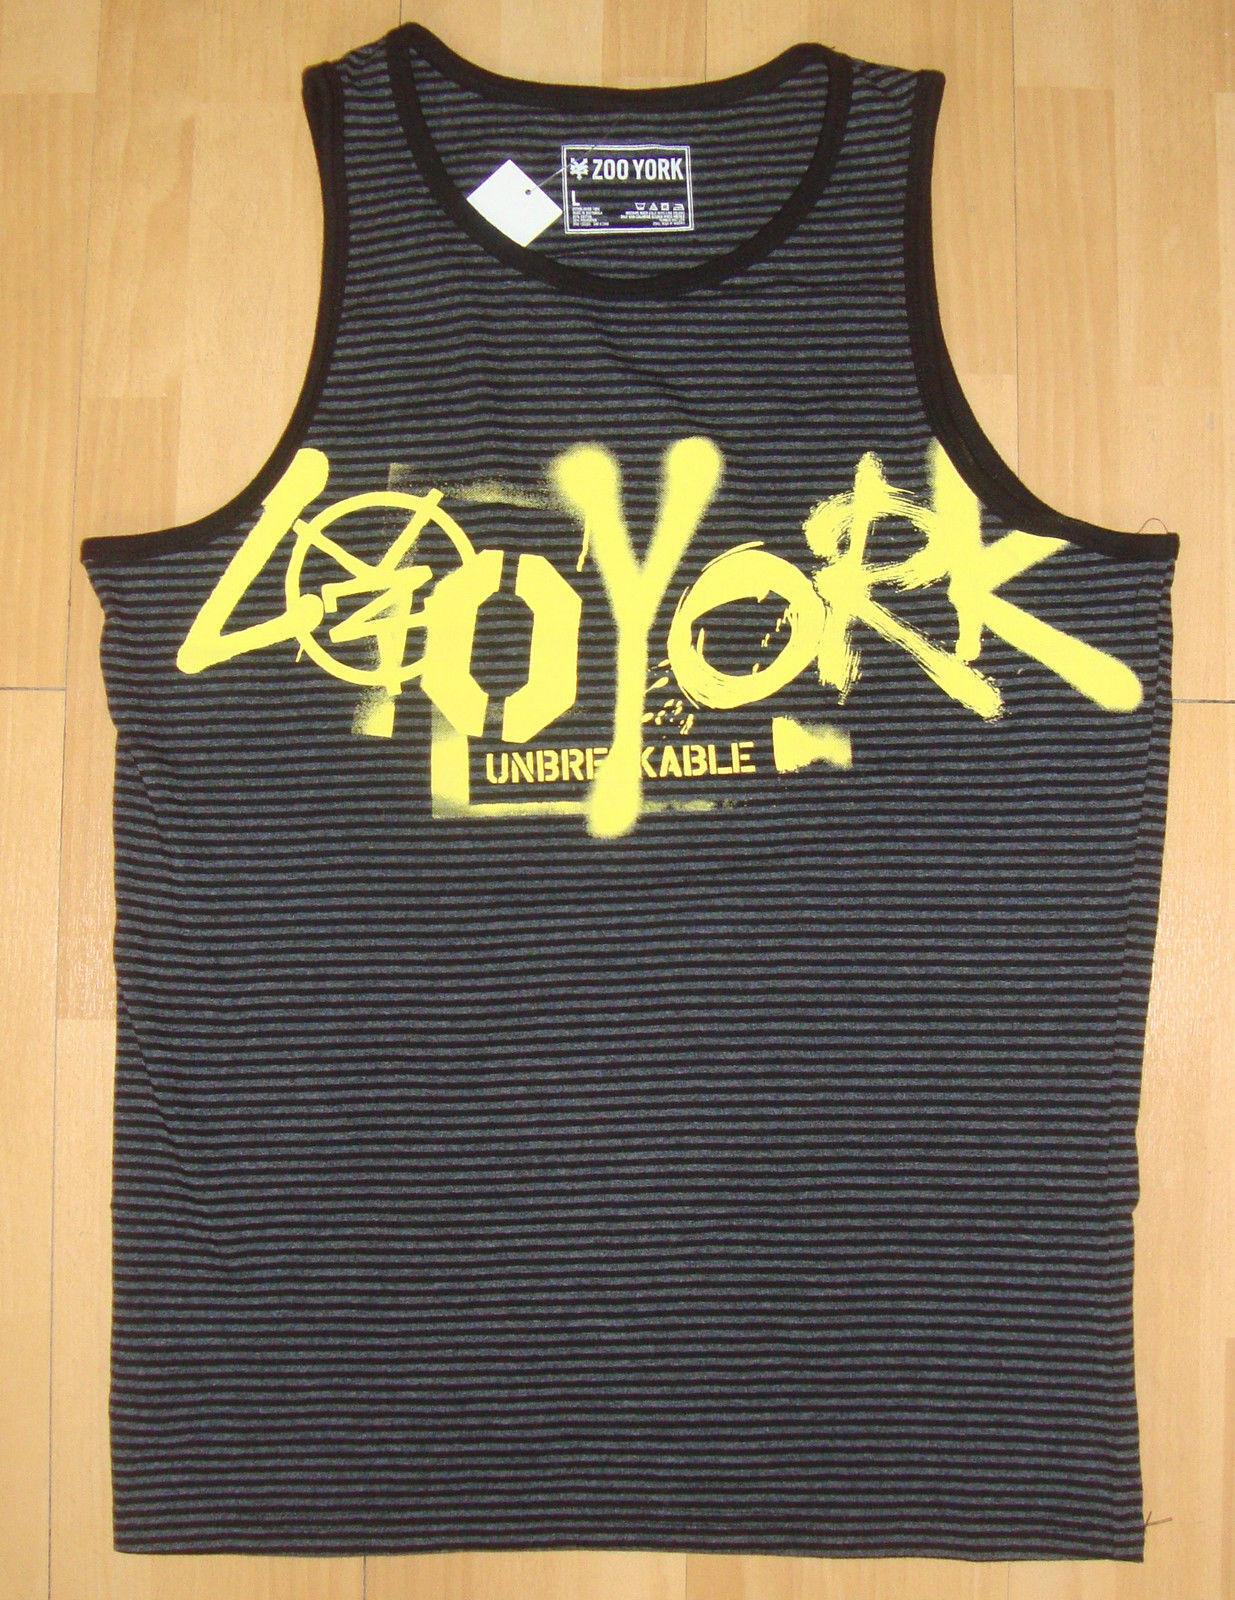 Spitfire/krooked/zoo York gemischte Tank Tank gemischte Top/Muskelshirt/Skateboard Weste feffae